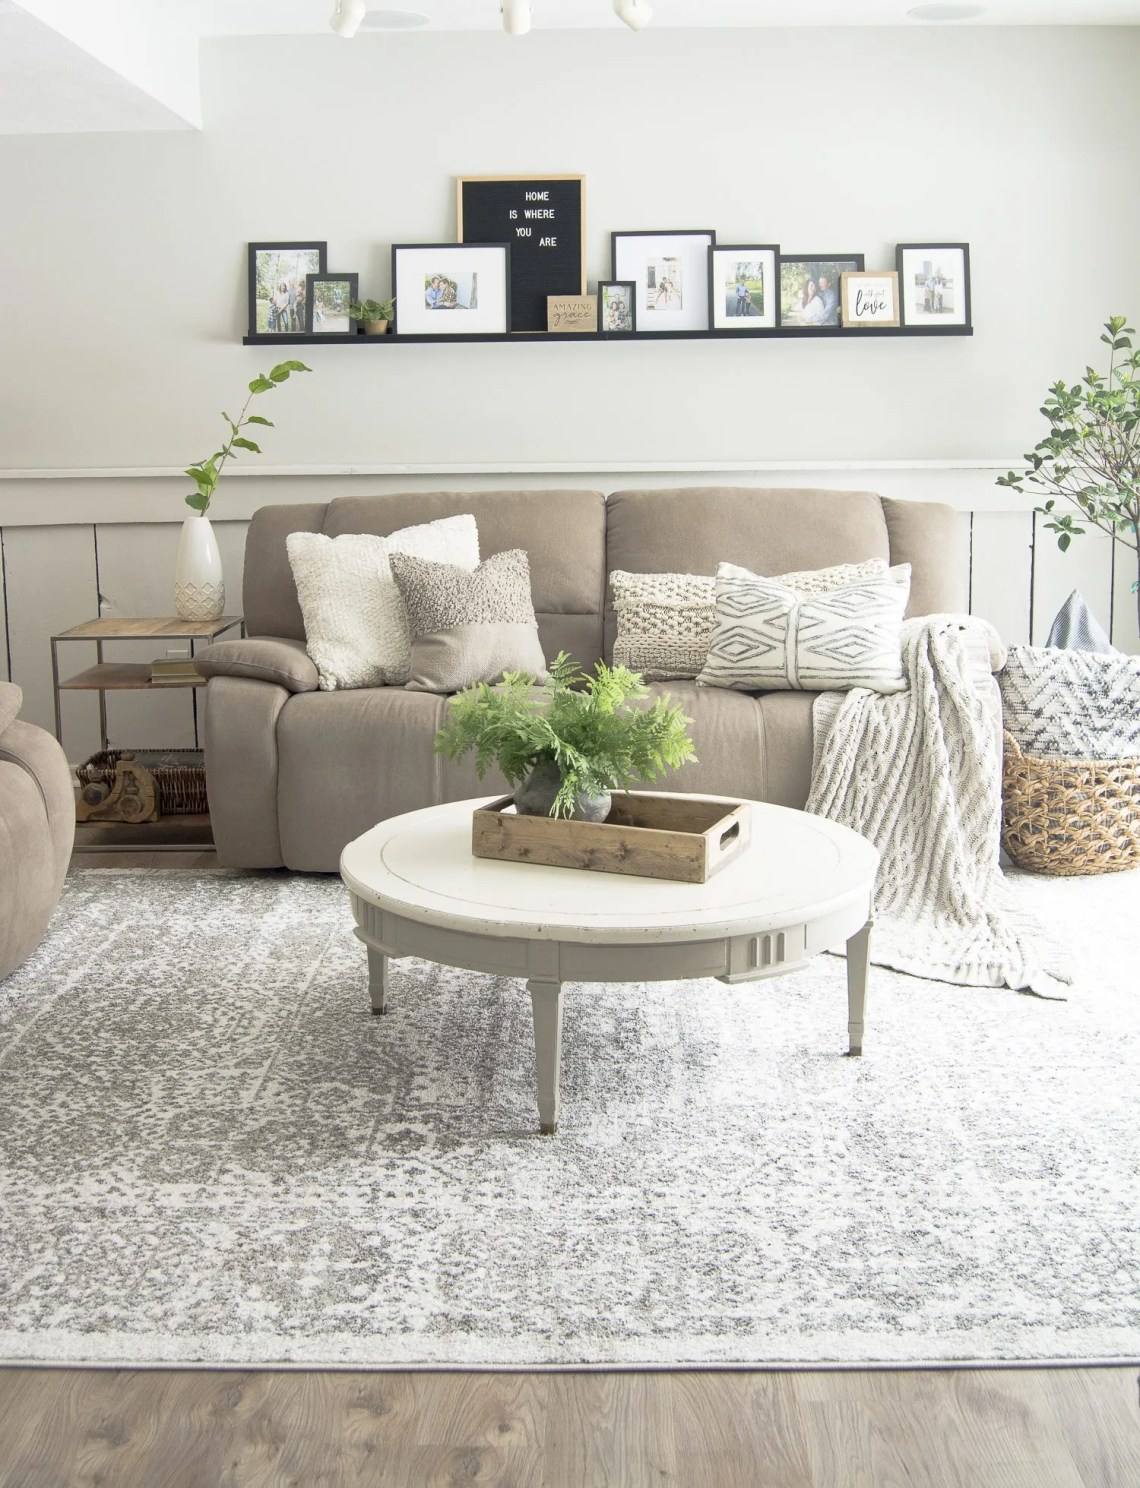 Modern Farmhouse Interior Design Style Guide | Grace In My ...